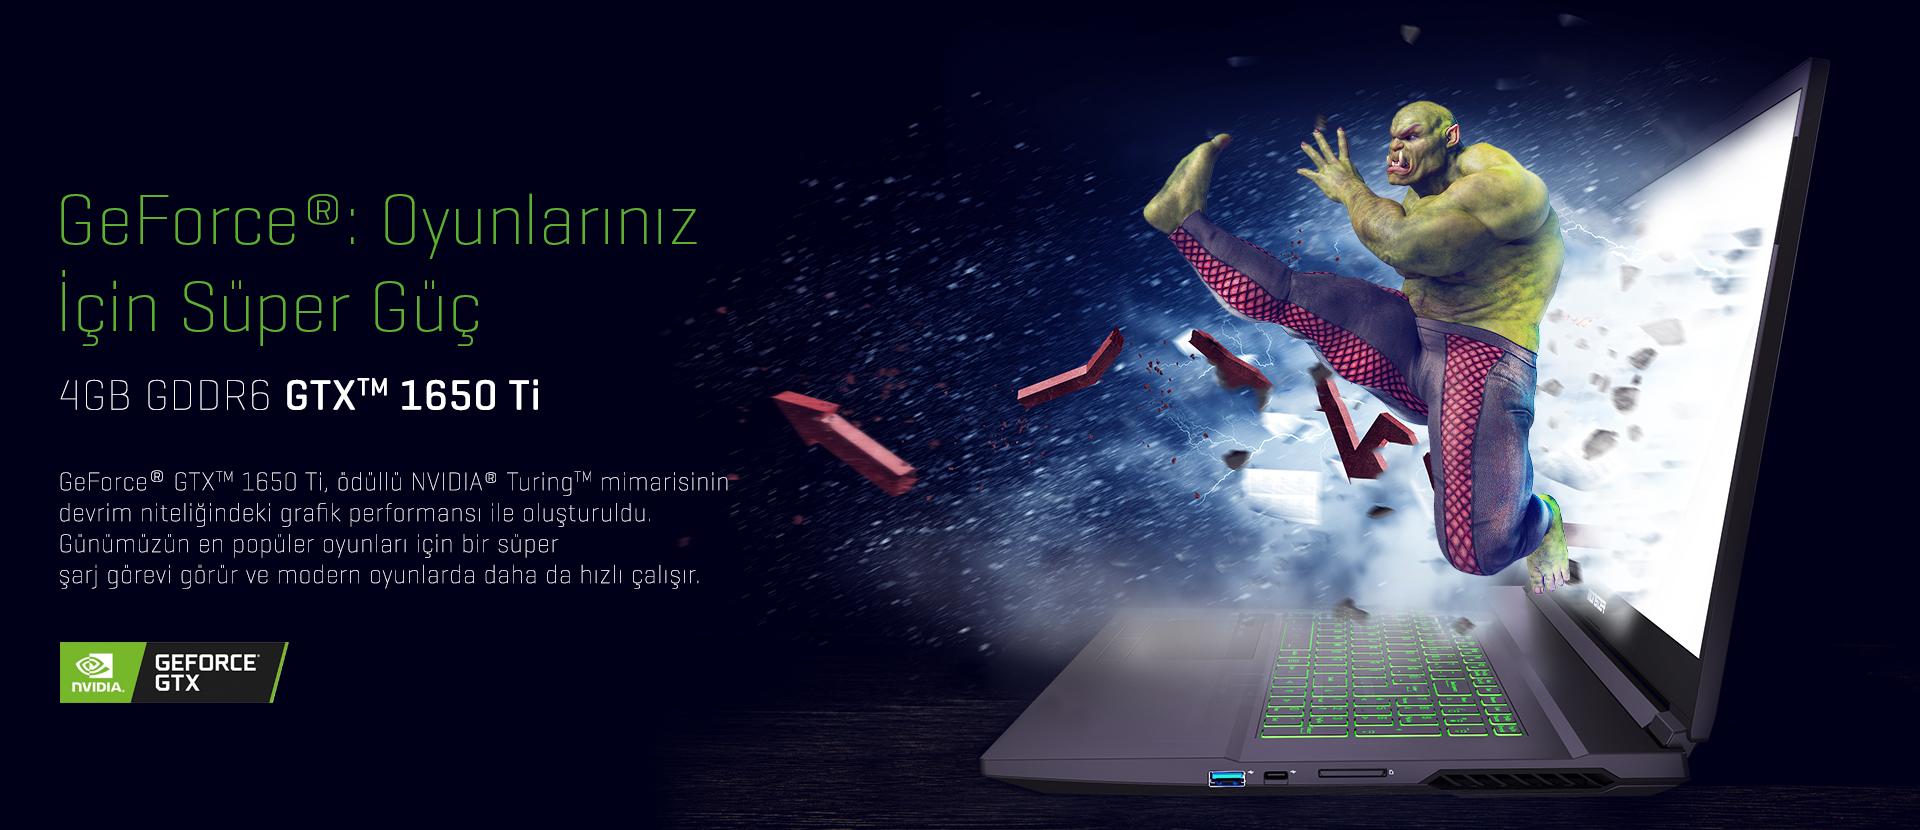 Monster Notebook Abra A7 V12.2